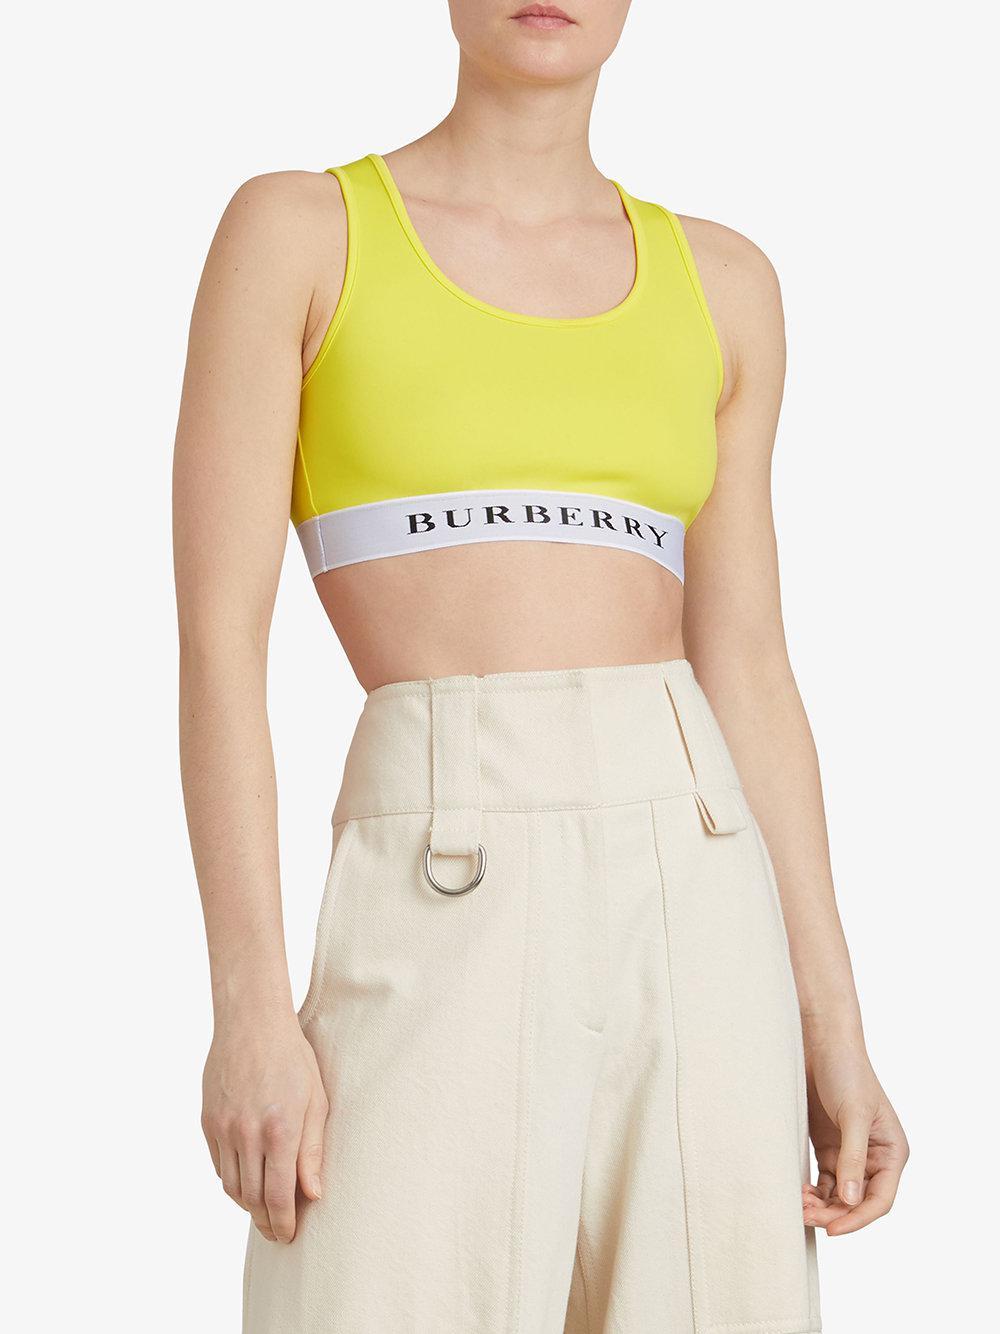 ca79504b10ed0 Burberry Betwa Logo Sports Bra in Yellow - Lyst